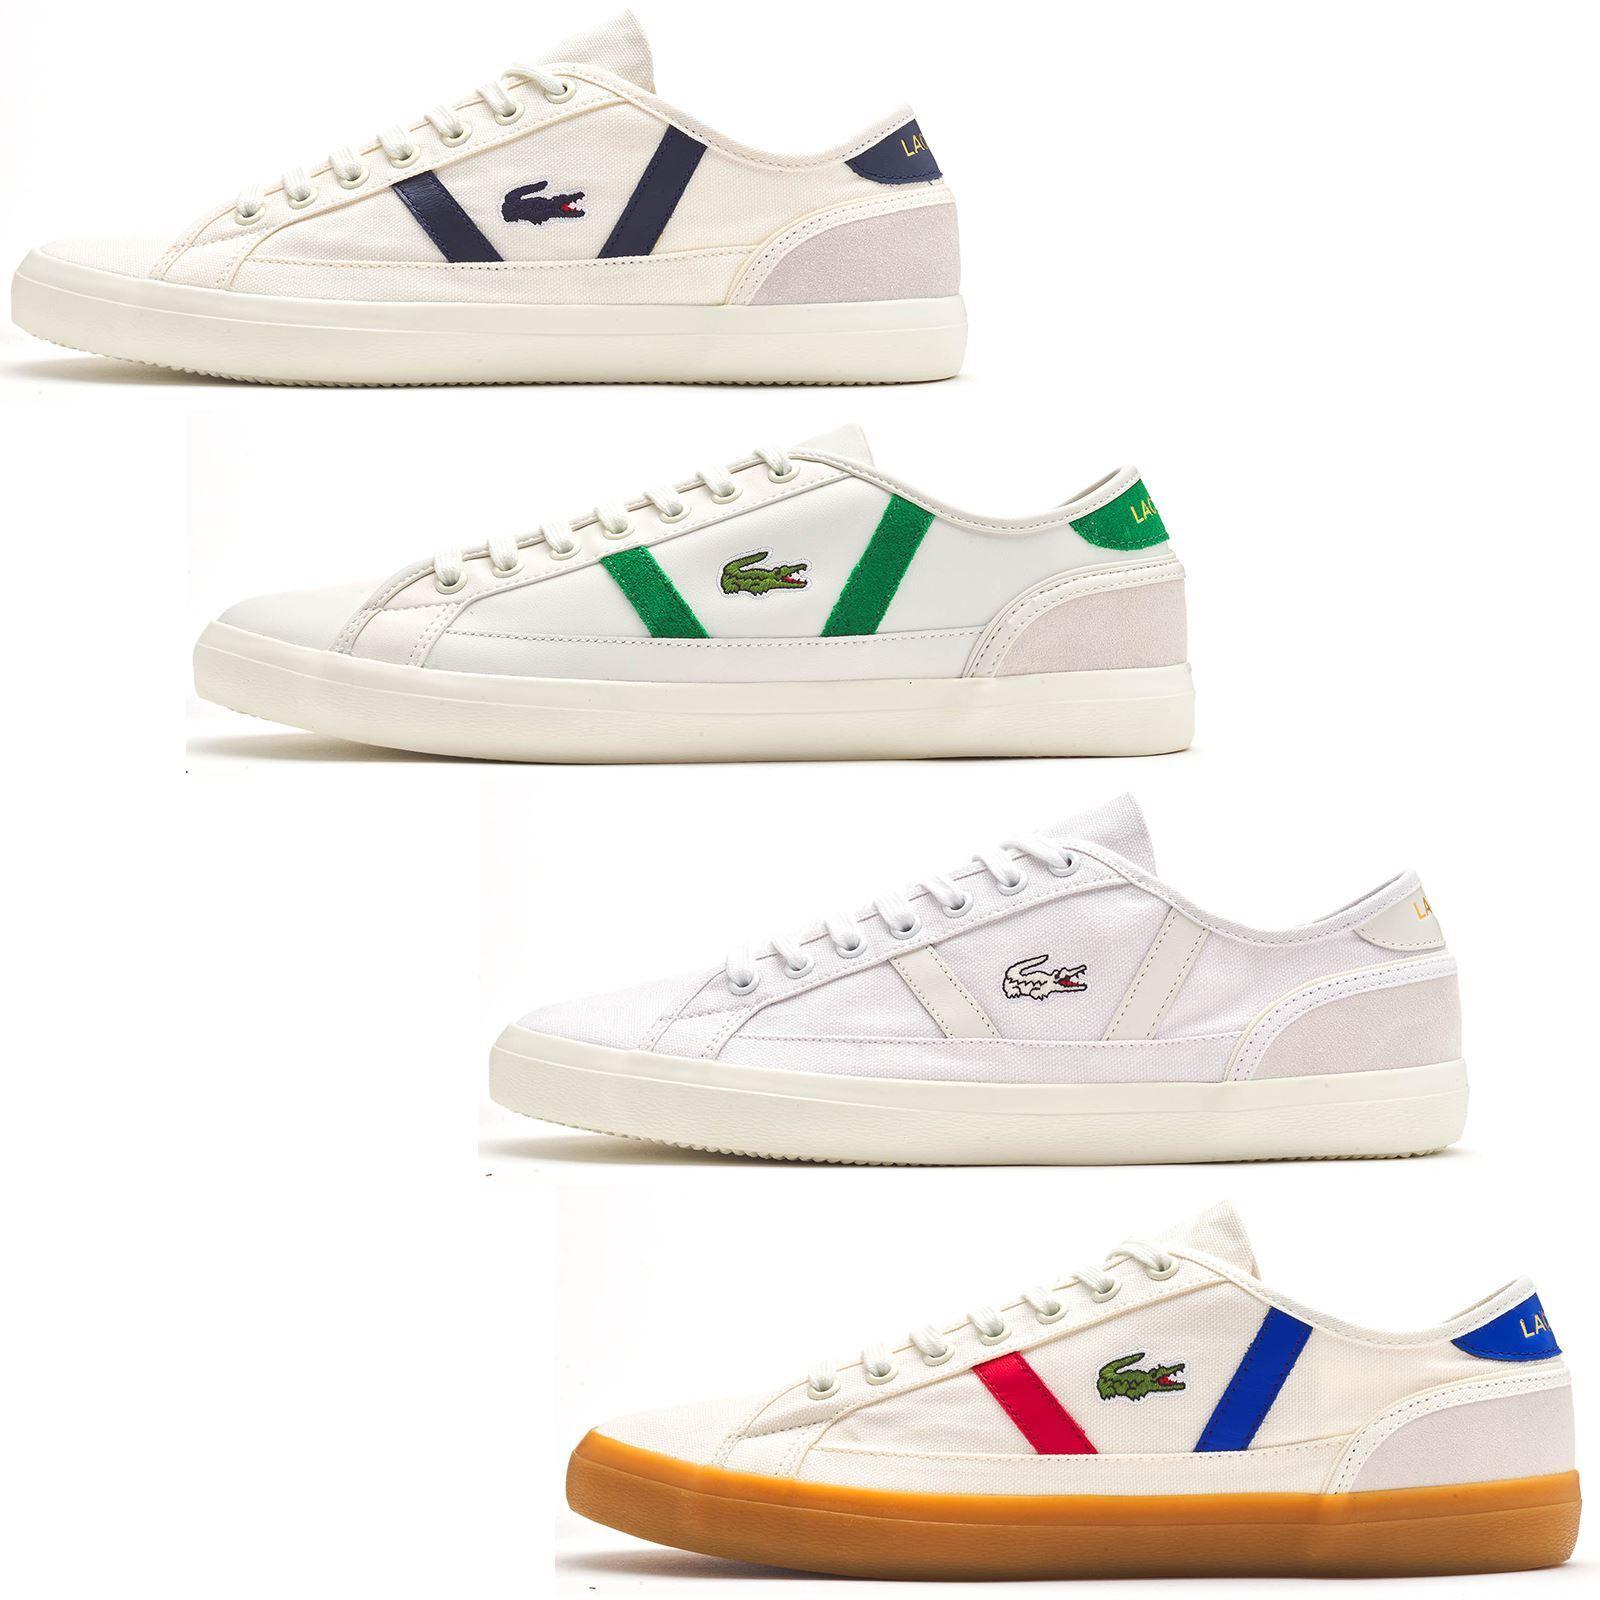 Lacoste Sideline 119 CMA Metallic Letterojo Heel Canvas & Leather blanco Trainers